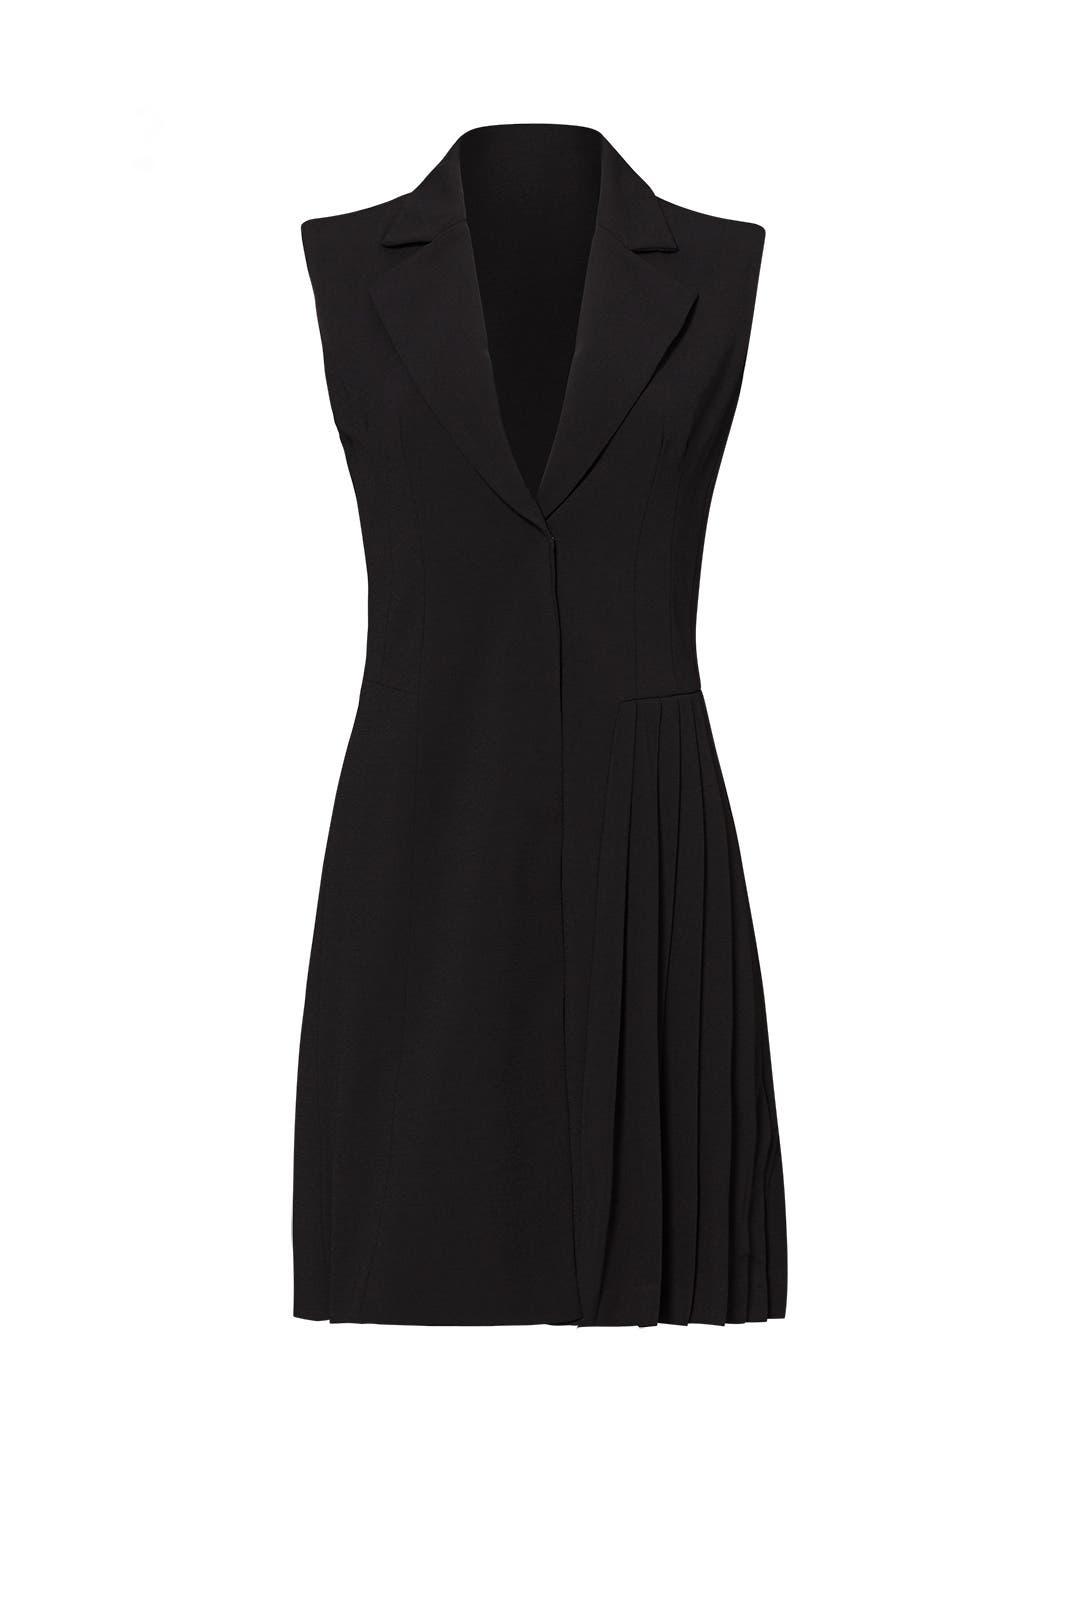 Black Vest Dress by ELLIATT